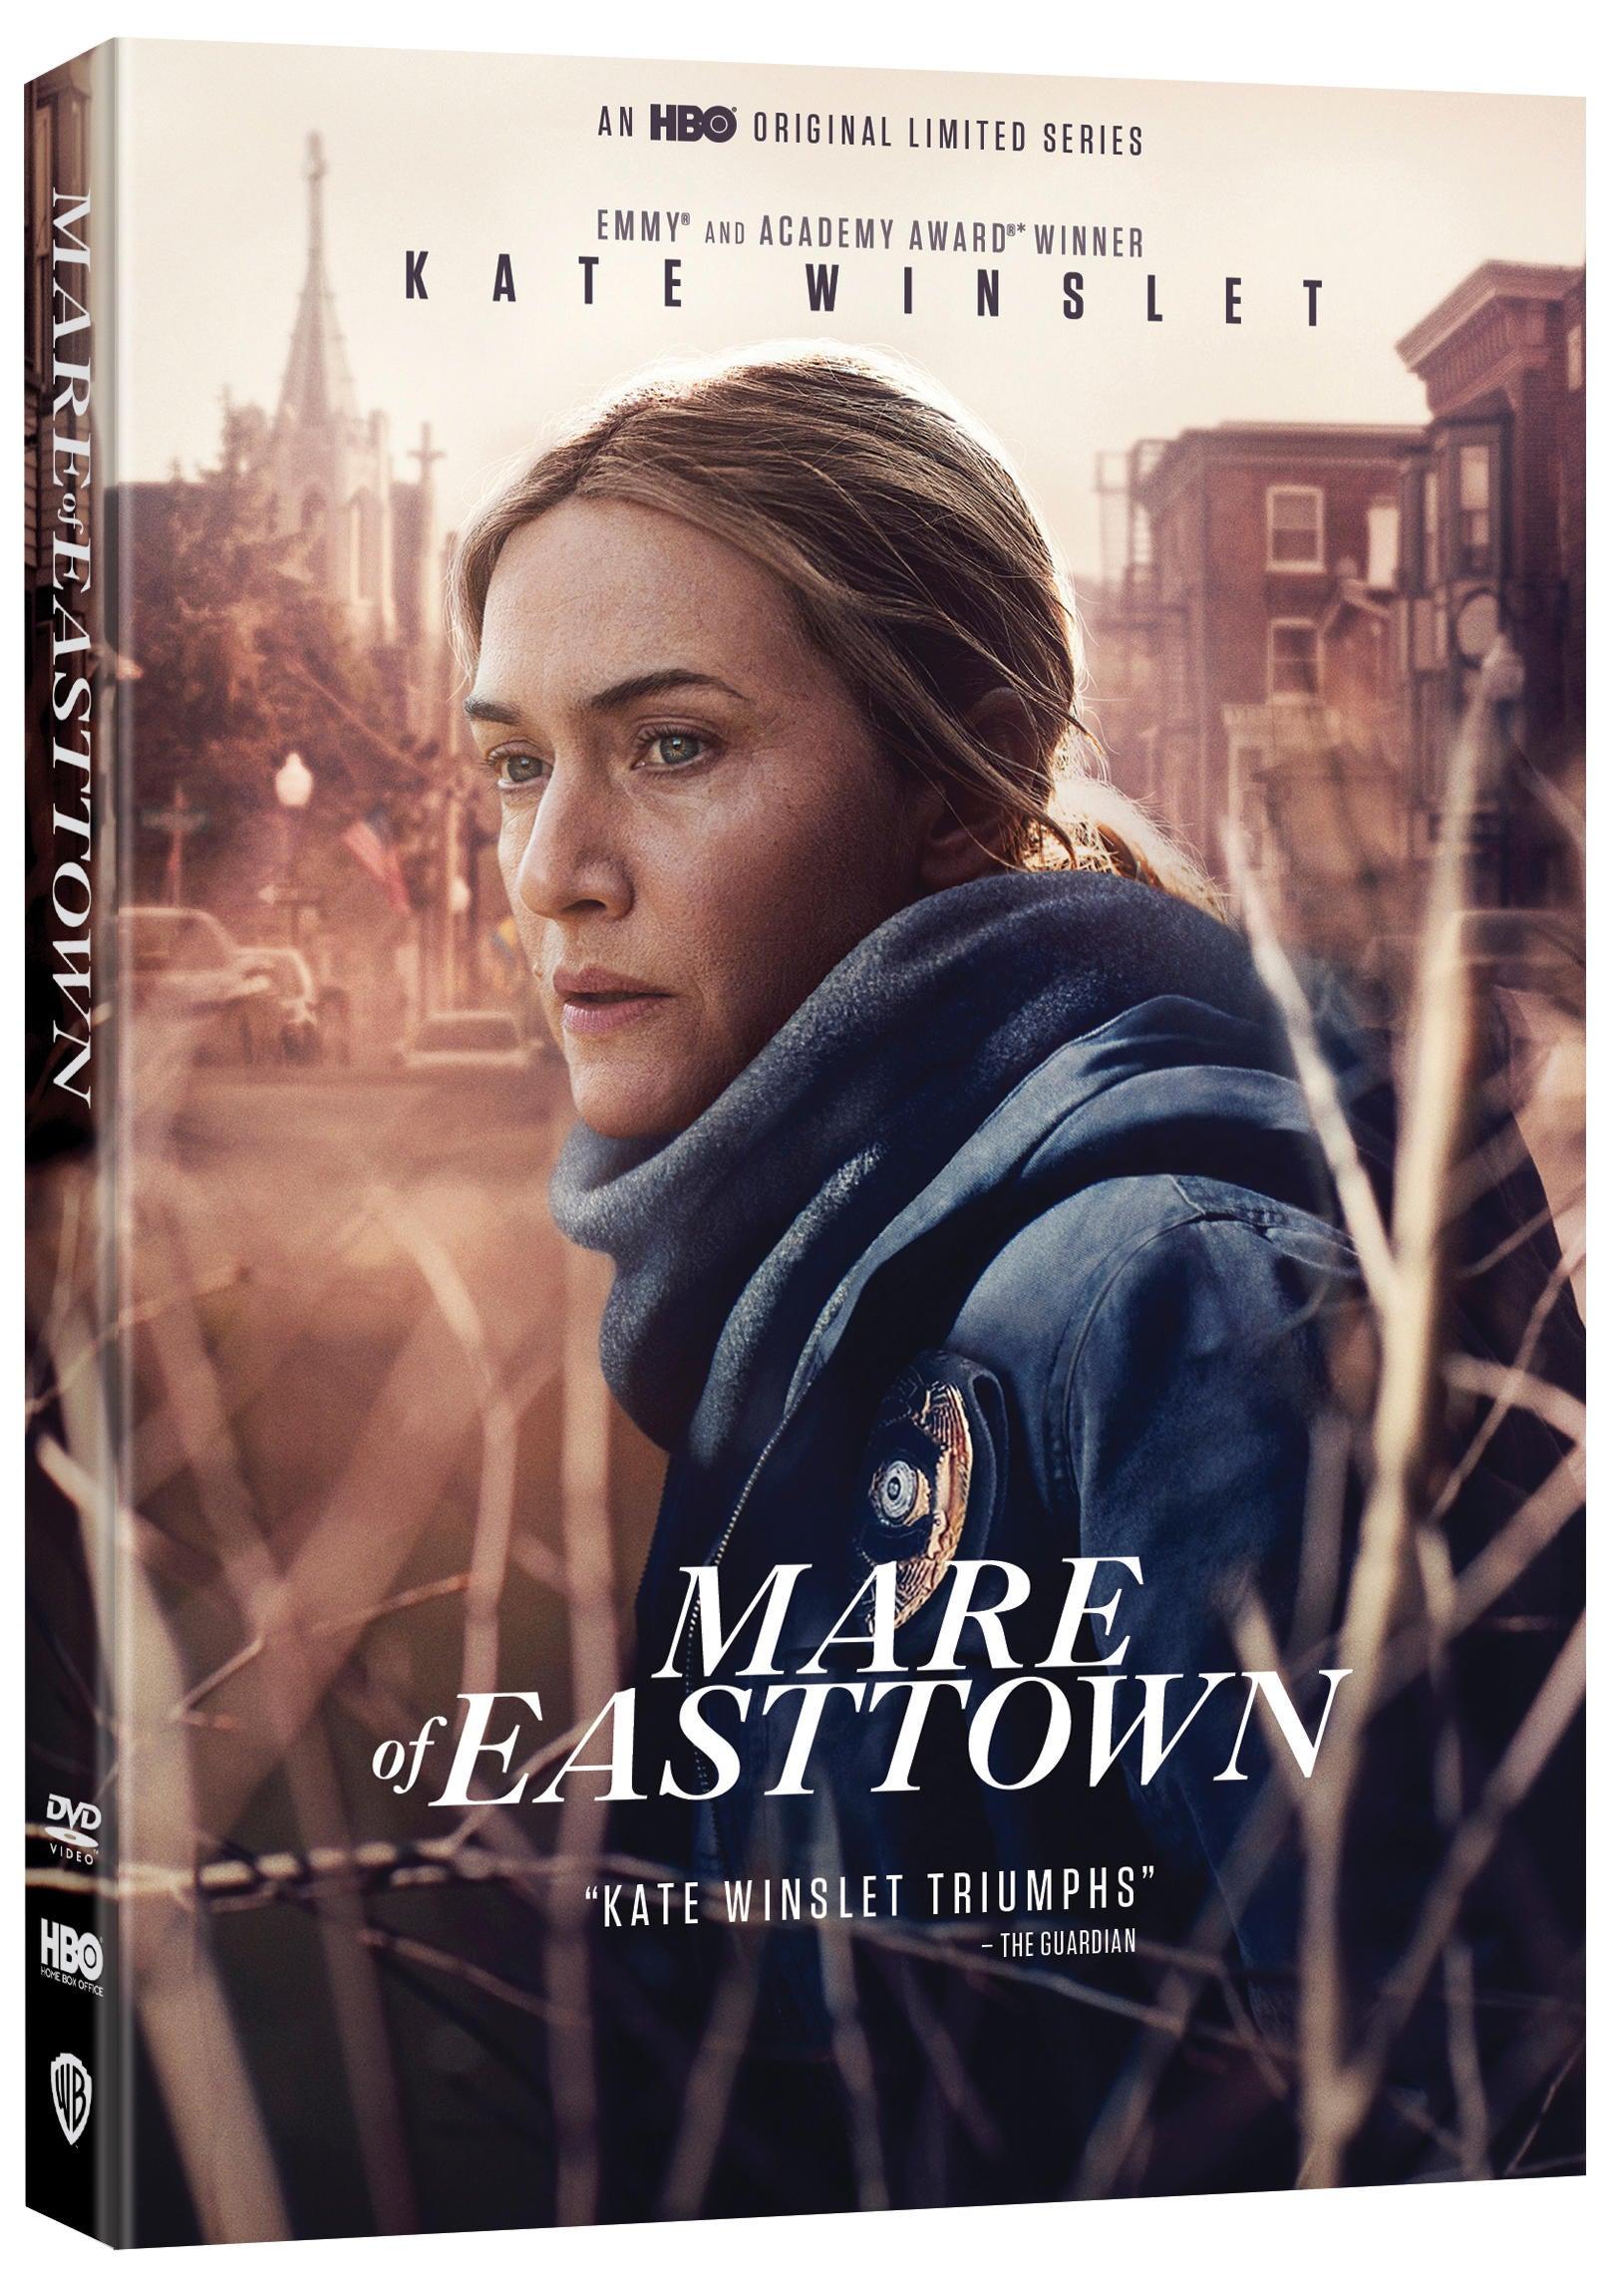 mare-of-easttown-dvd-box-set.jpg